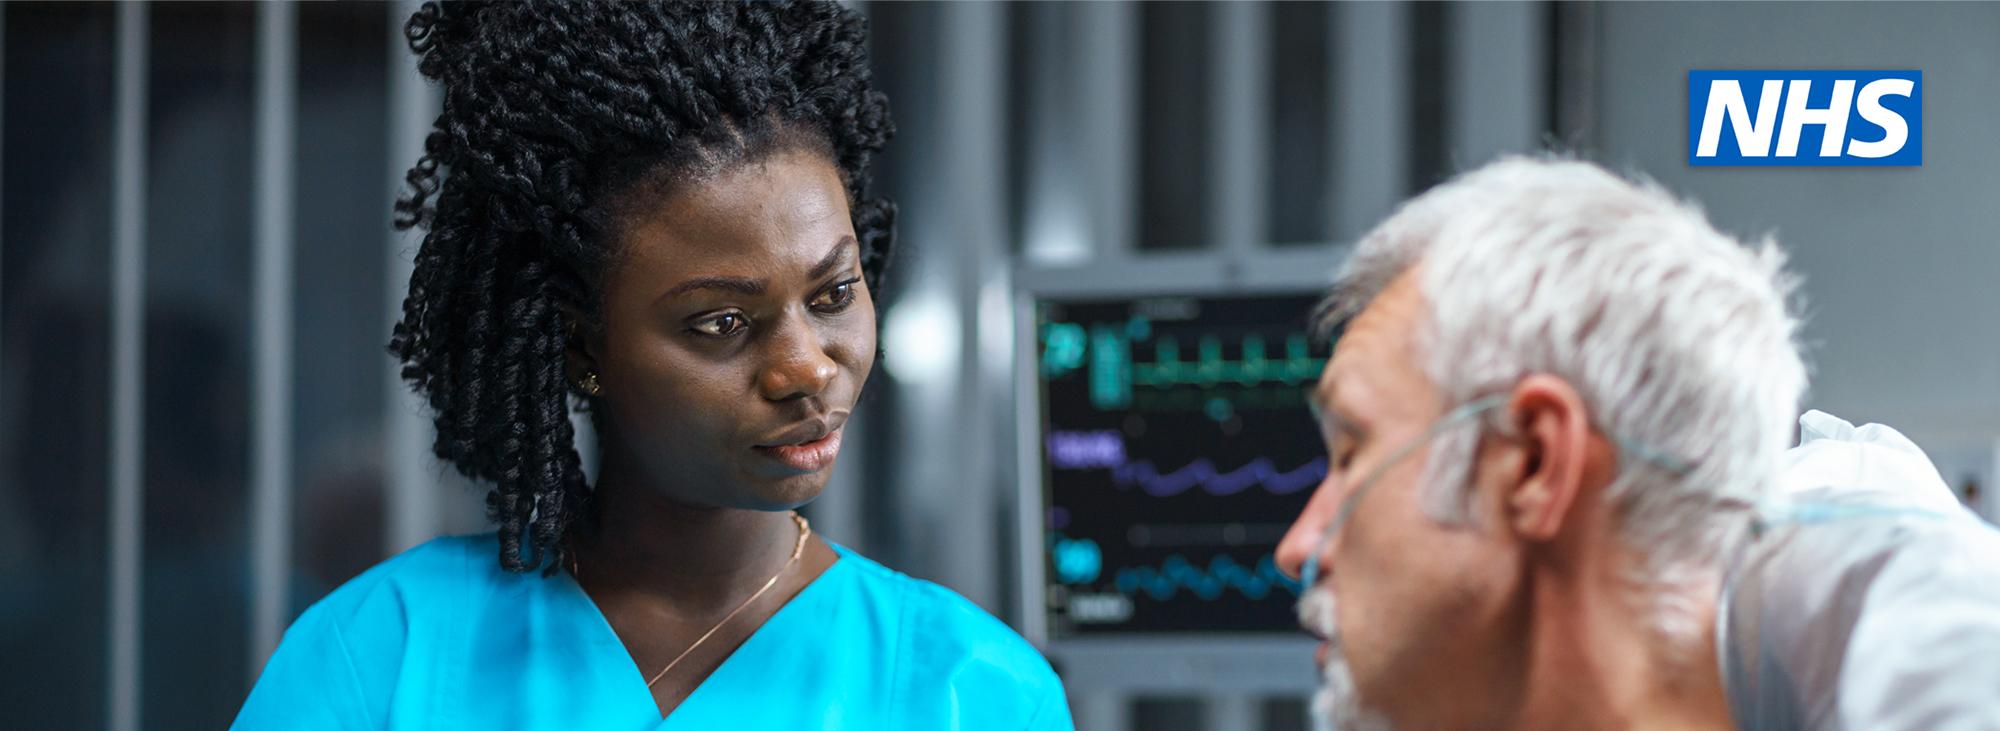 Career development opportunities for I.C.U. nurses in the U.K.